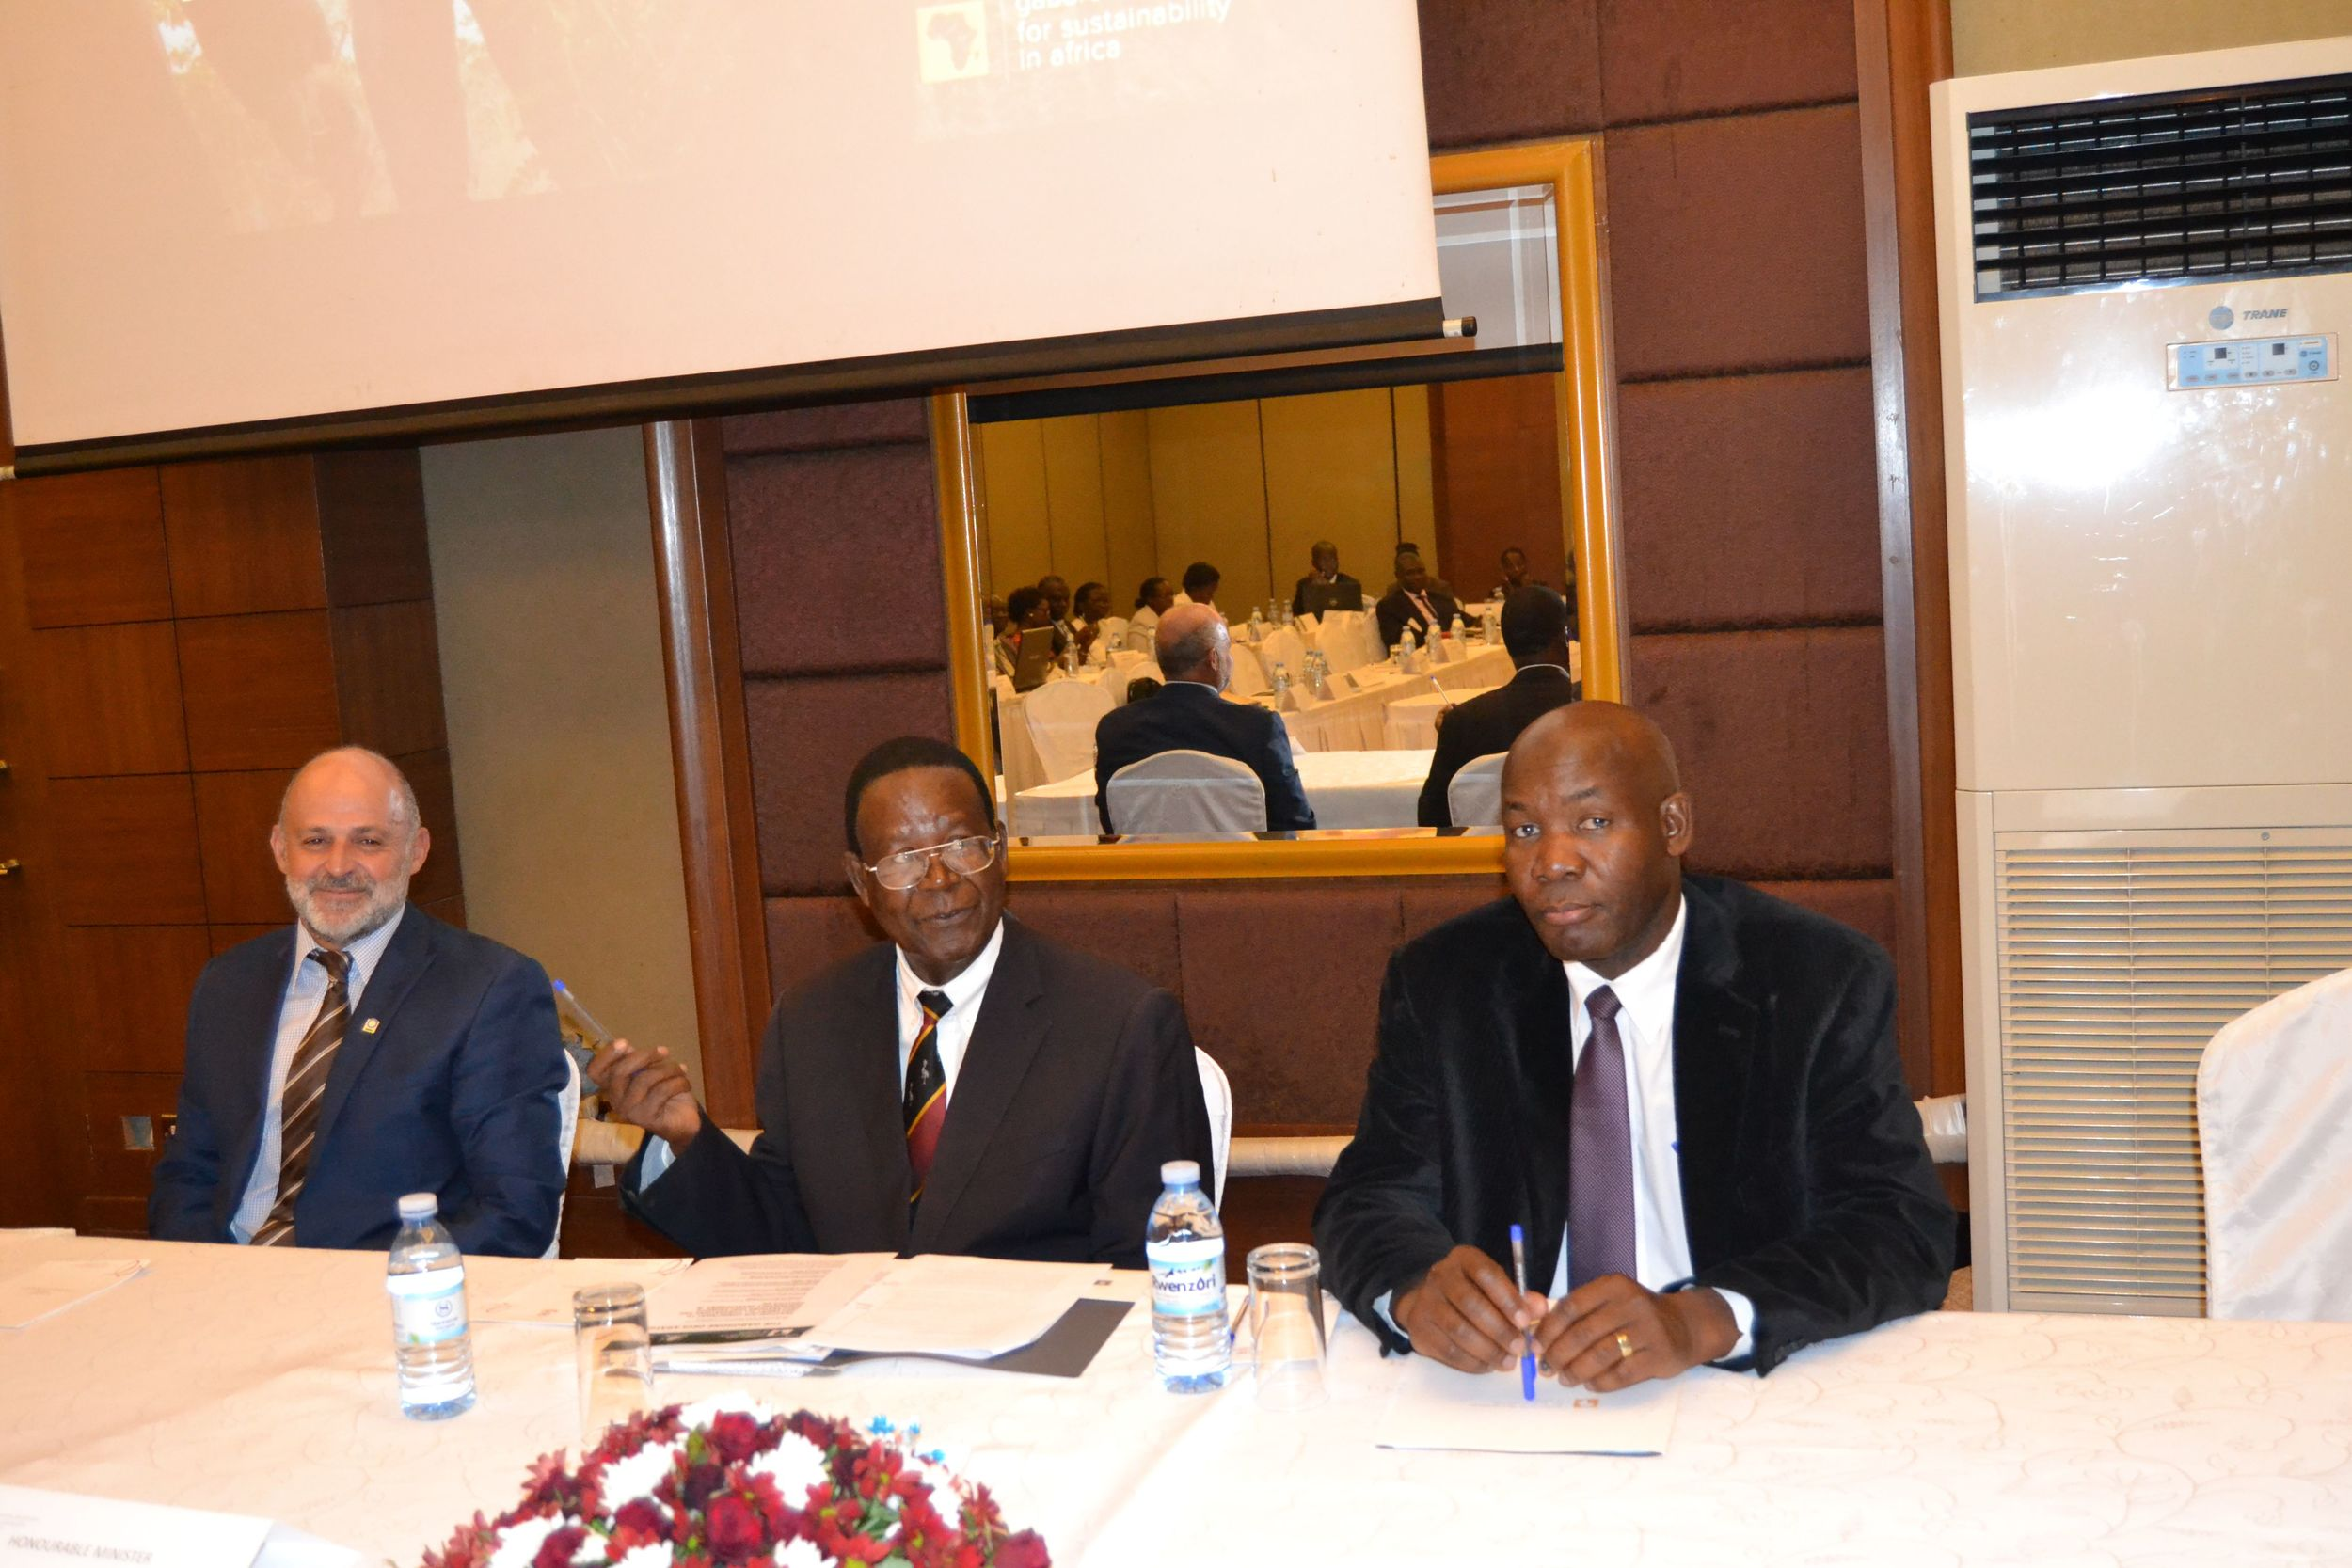 Right, CI Representative Mr Carlos Manuel Rodriguez Centre( Minister of Water and Environment  Hon Pro Ephraim Kamuntu, (left) Government of Botswana Representative Mr. Botshabelo Othusitse